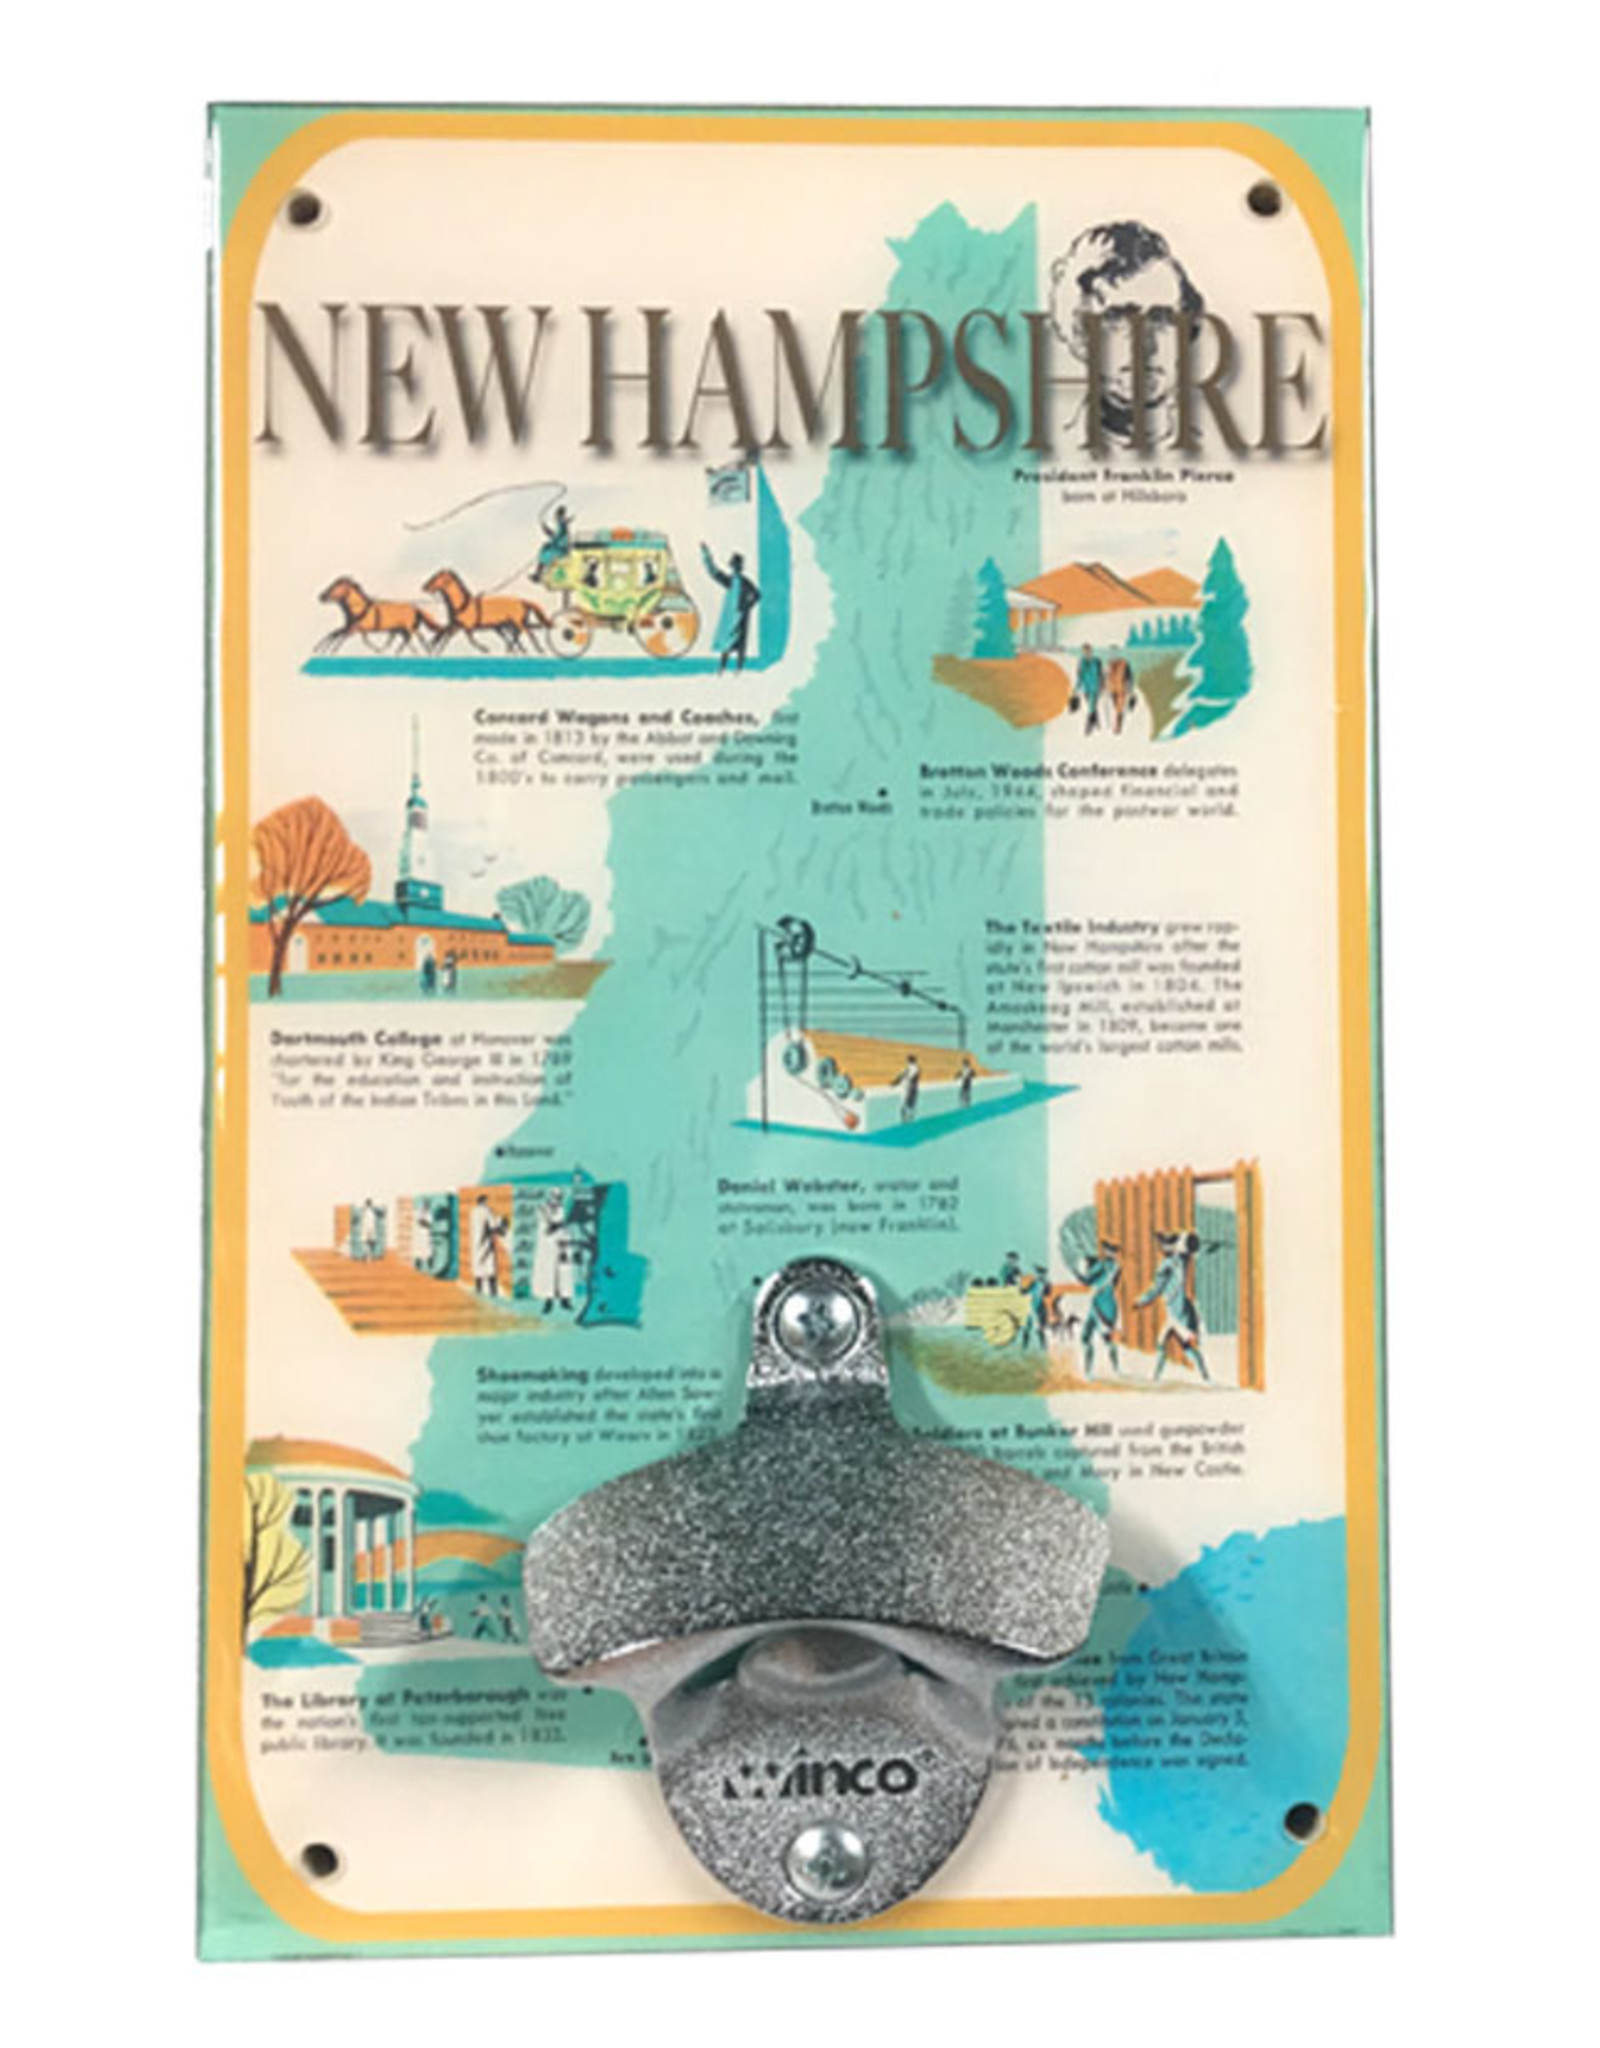 New Hampshire History Bottle Opener